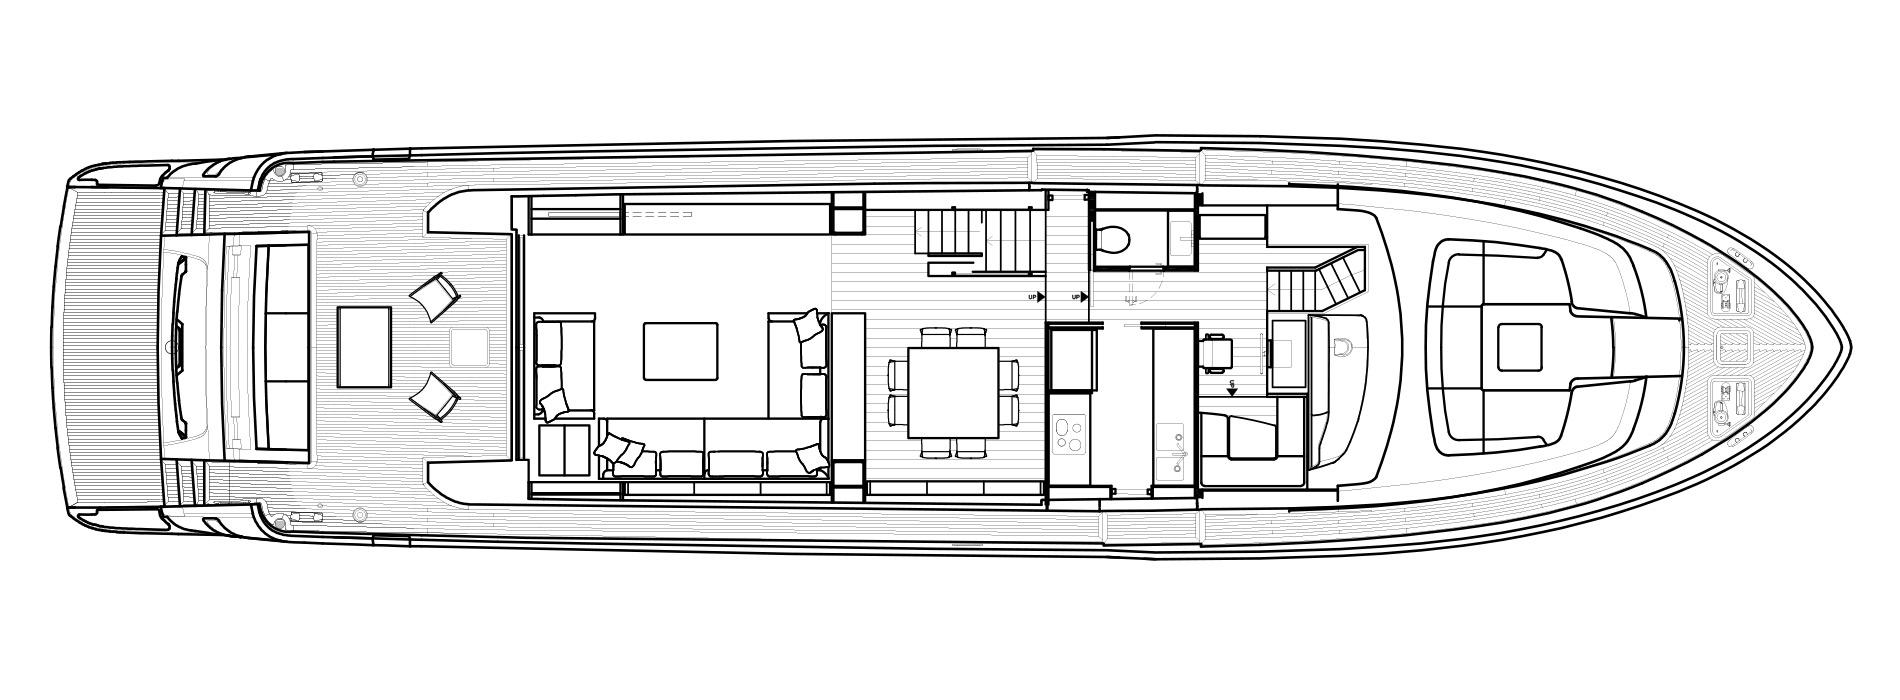 Sanlorenzo Yachts SL86 Main deck Versione A